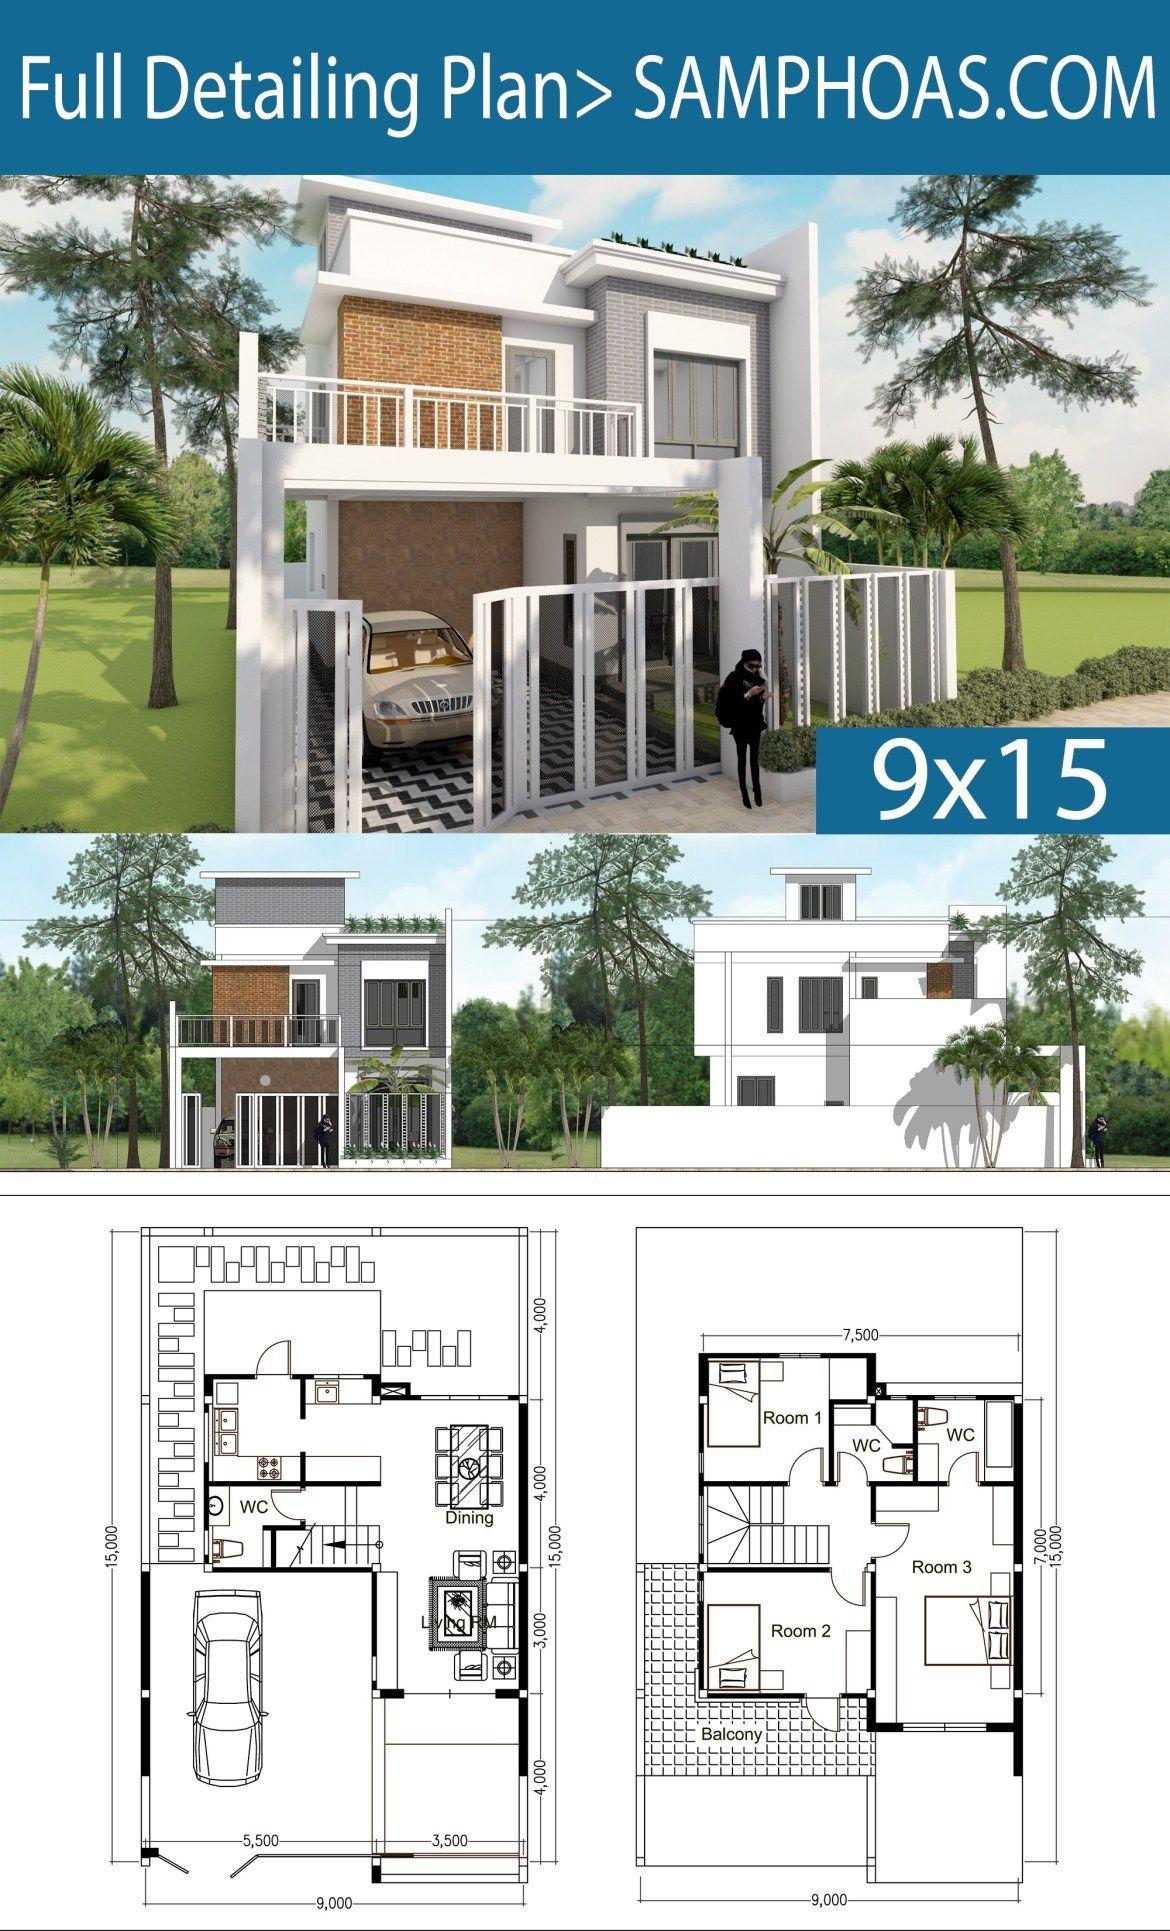 3 Bedroom House Plan Plot Size 9x15 Samphoas Plansearch House Plans Victorian House Plans House Layouts